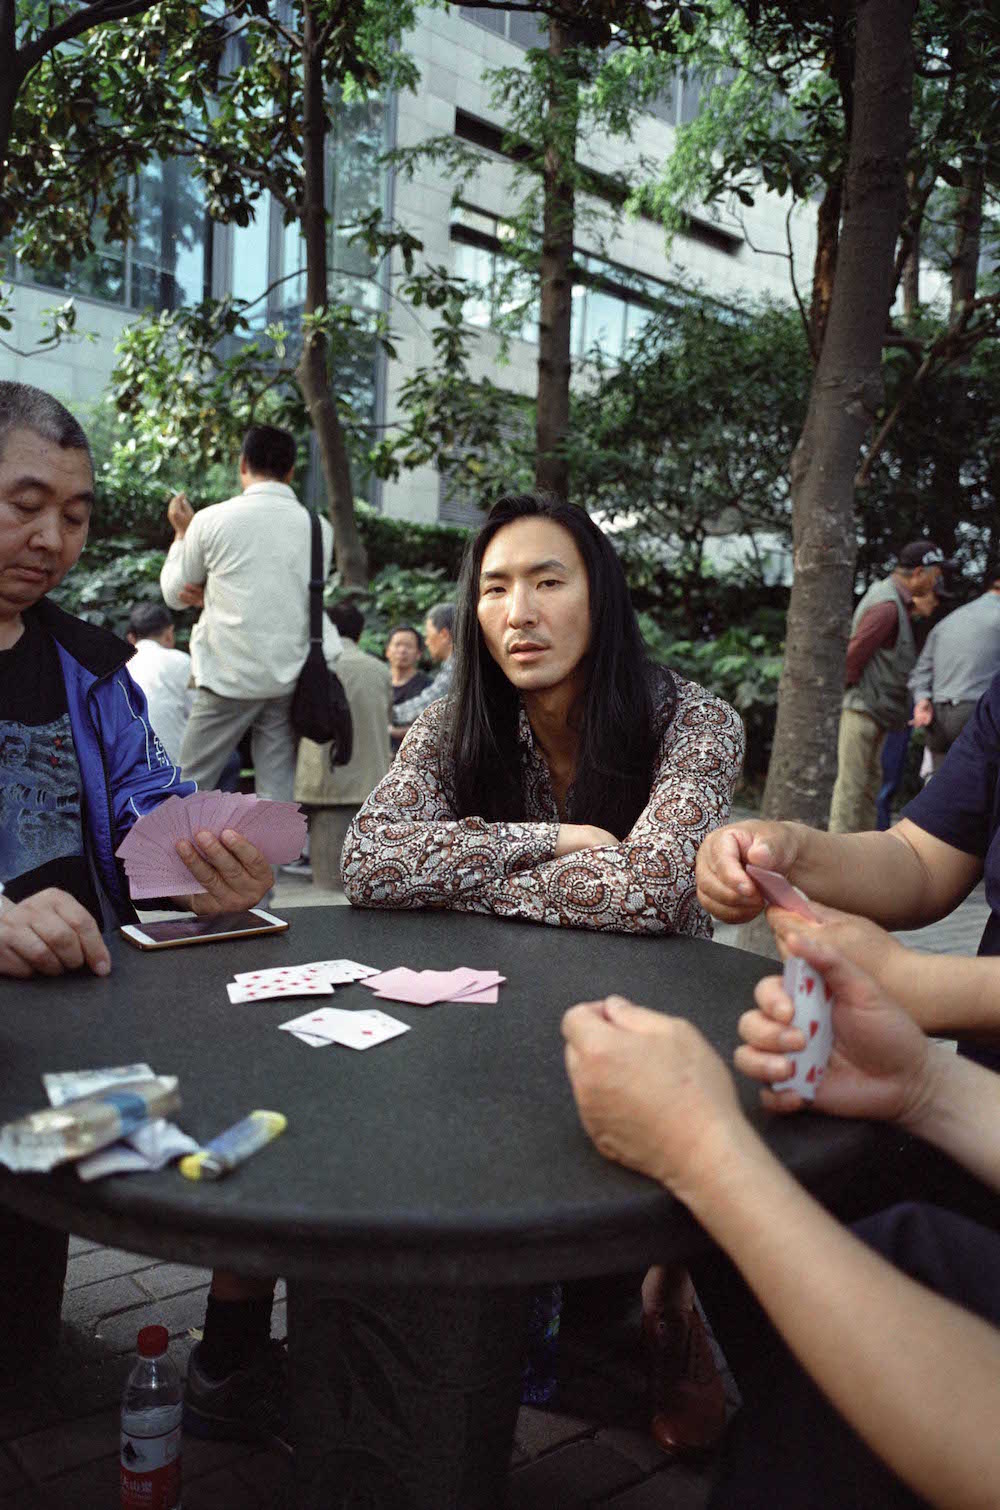 duran-levinson-shanghai-photography-1.jpg